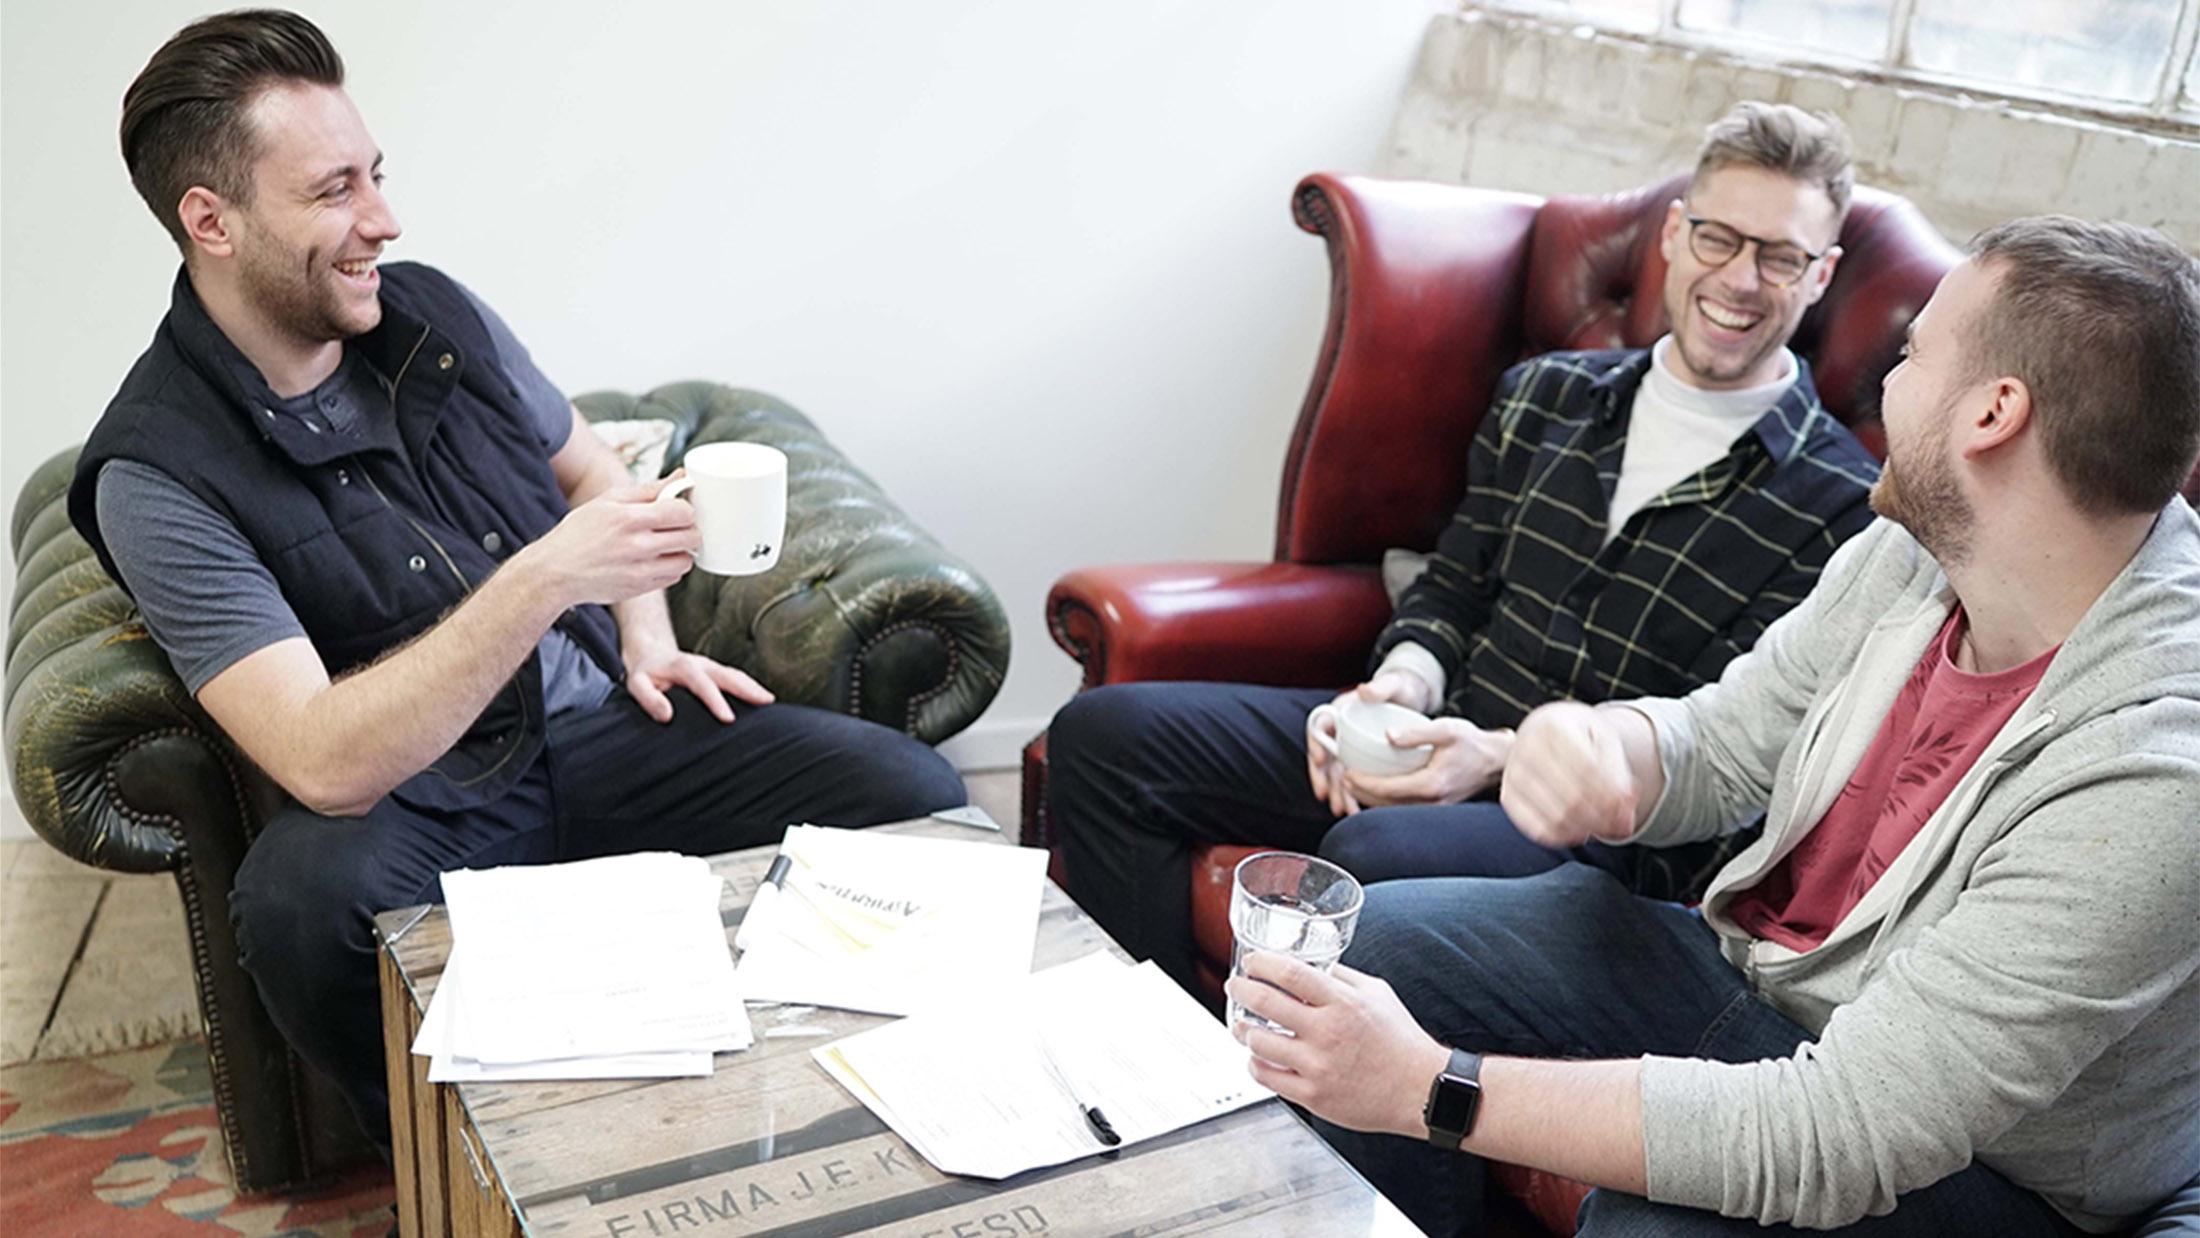 Luke Newbold Leads Client Meeting at Camden Town Studio